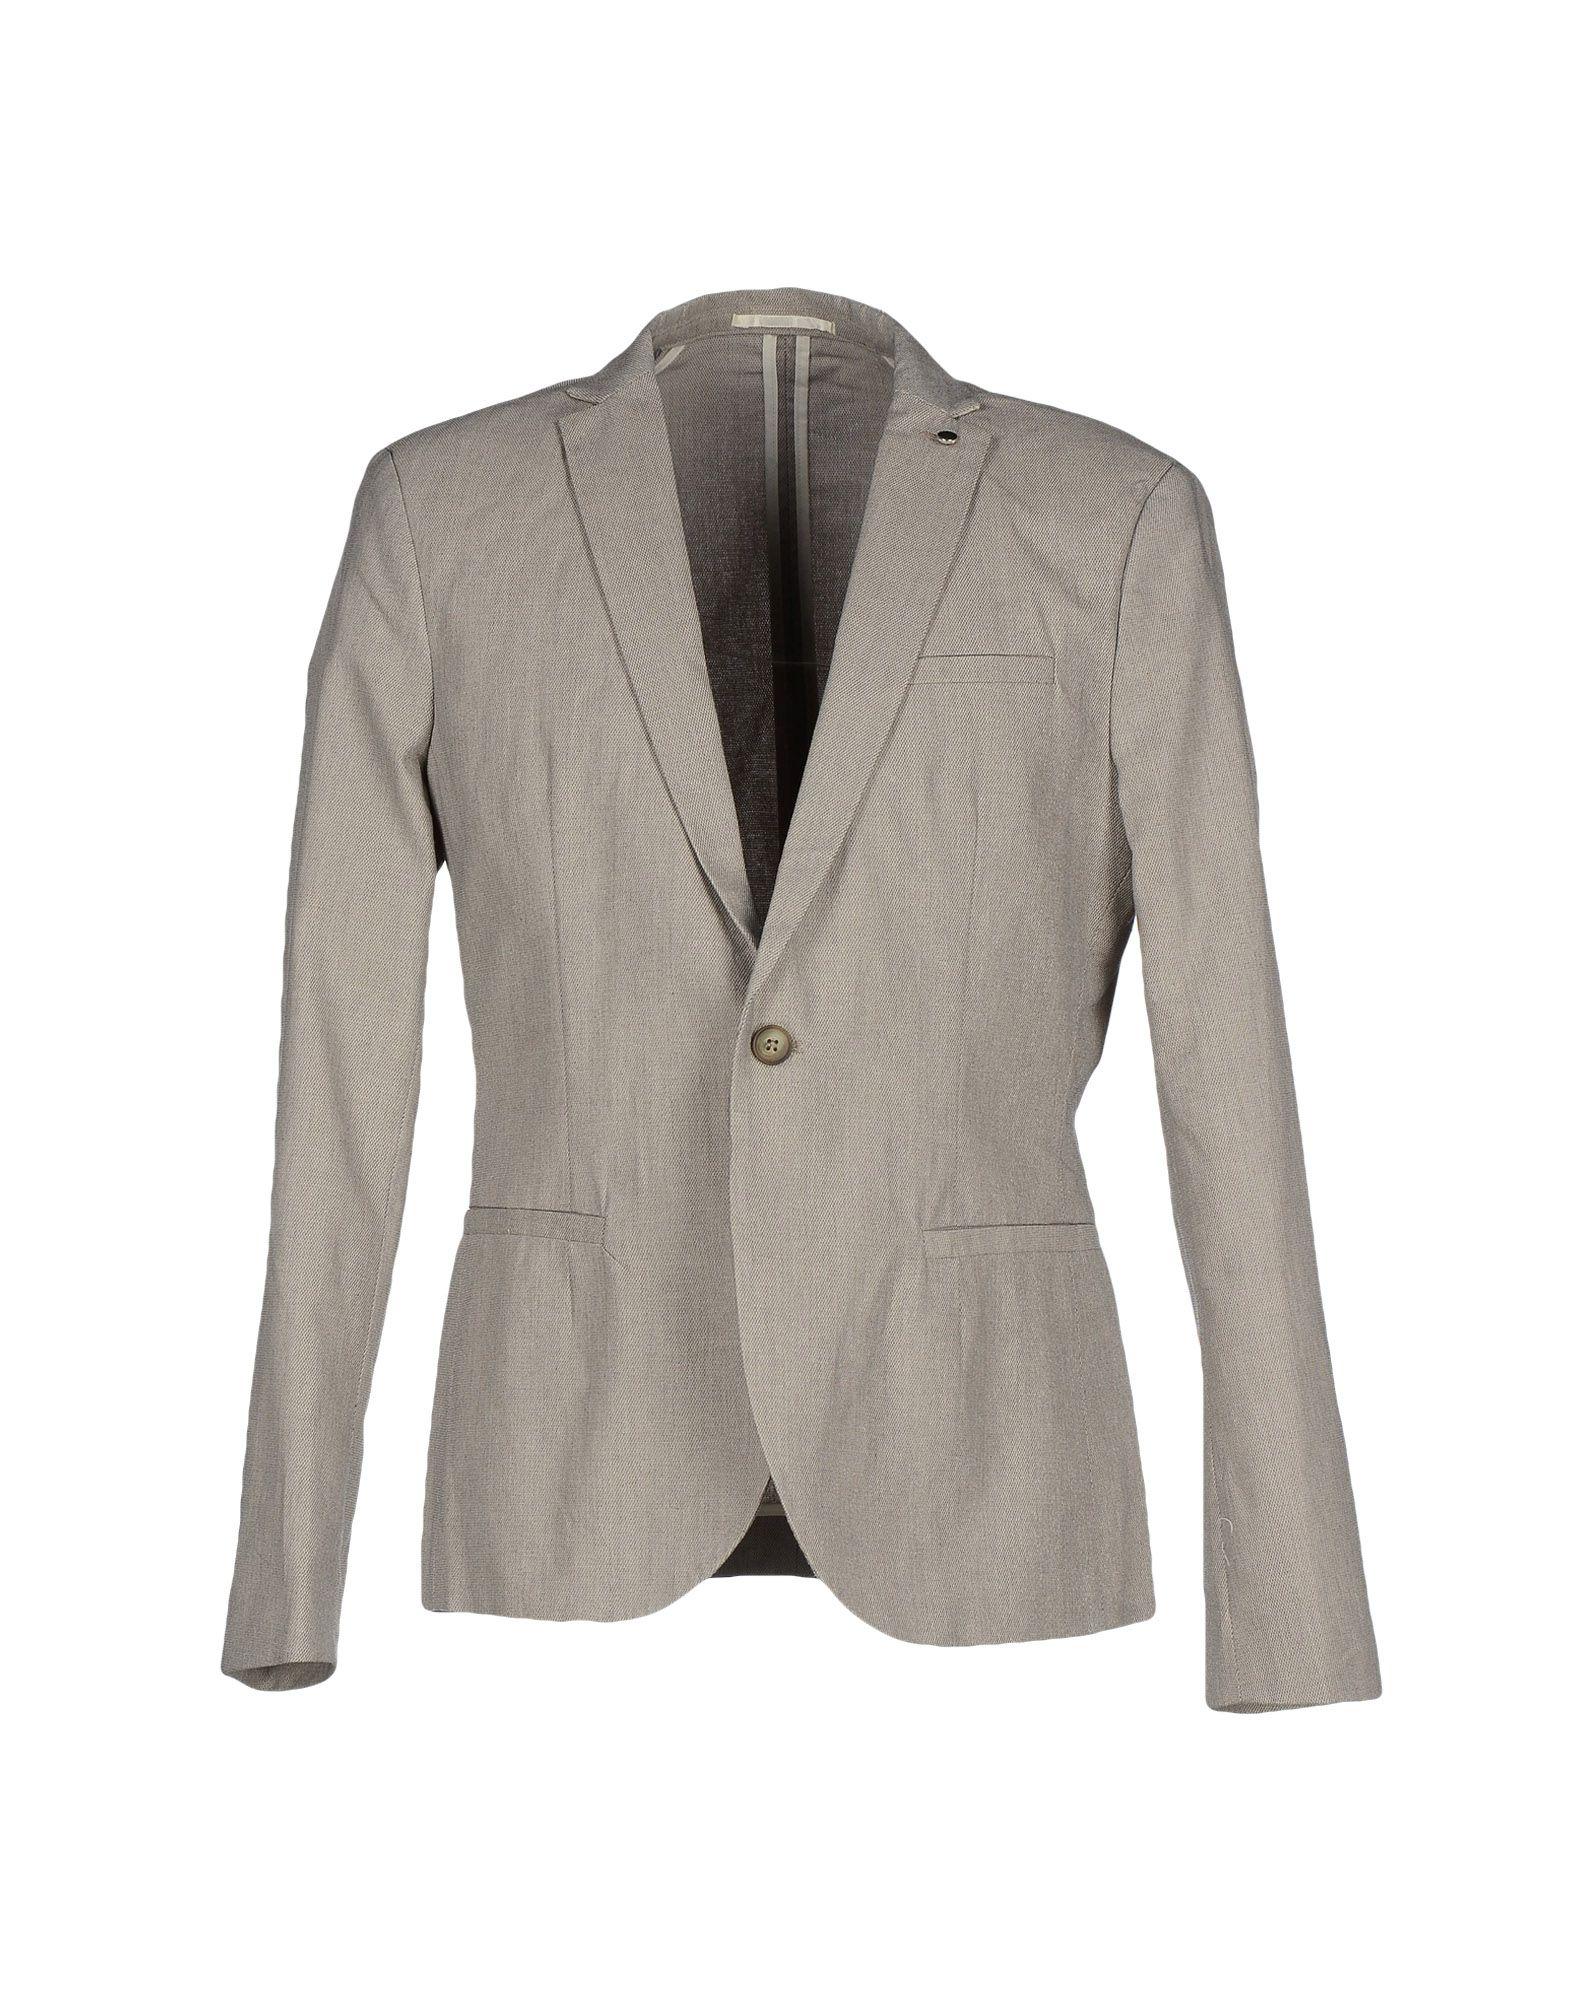 SELECTED HOMME Пиджак пиджак костюм tudor homme 233y38f90